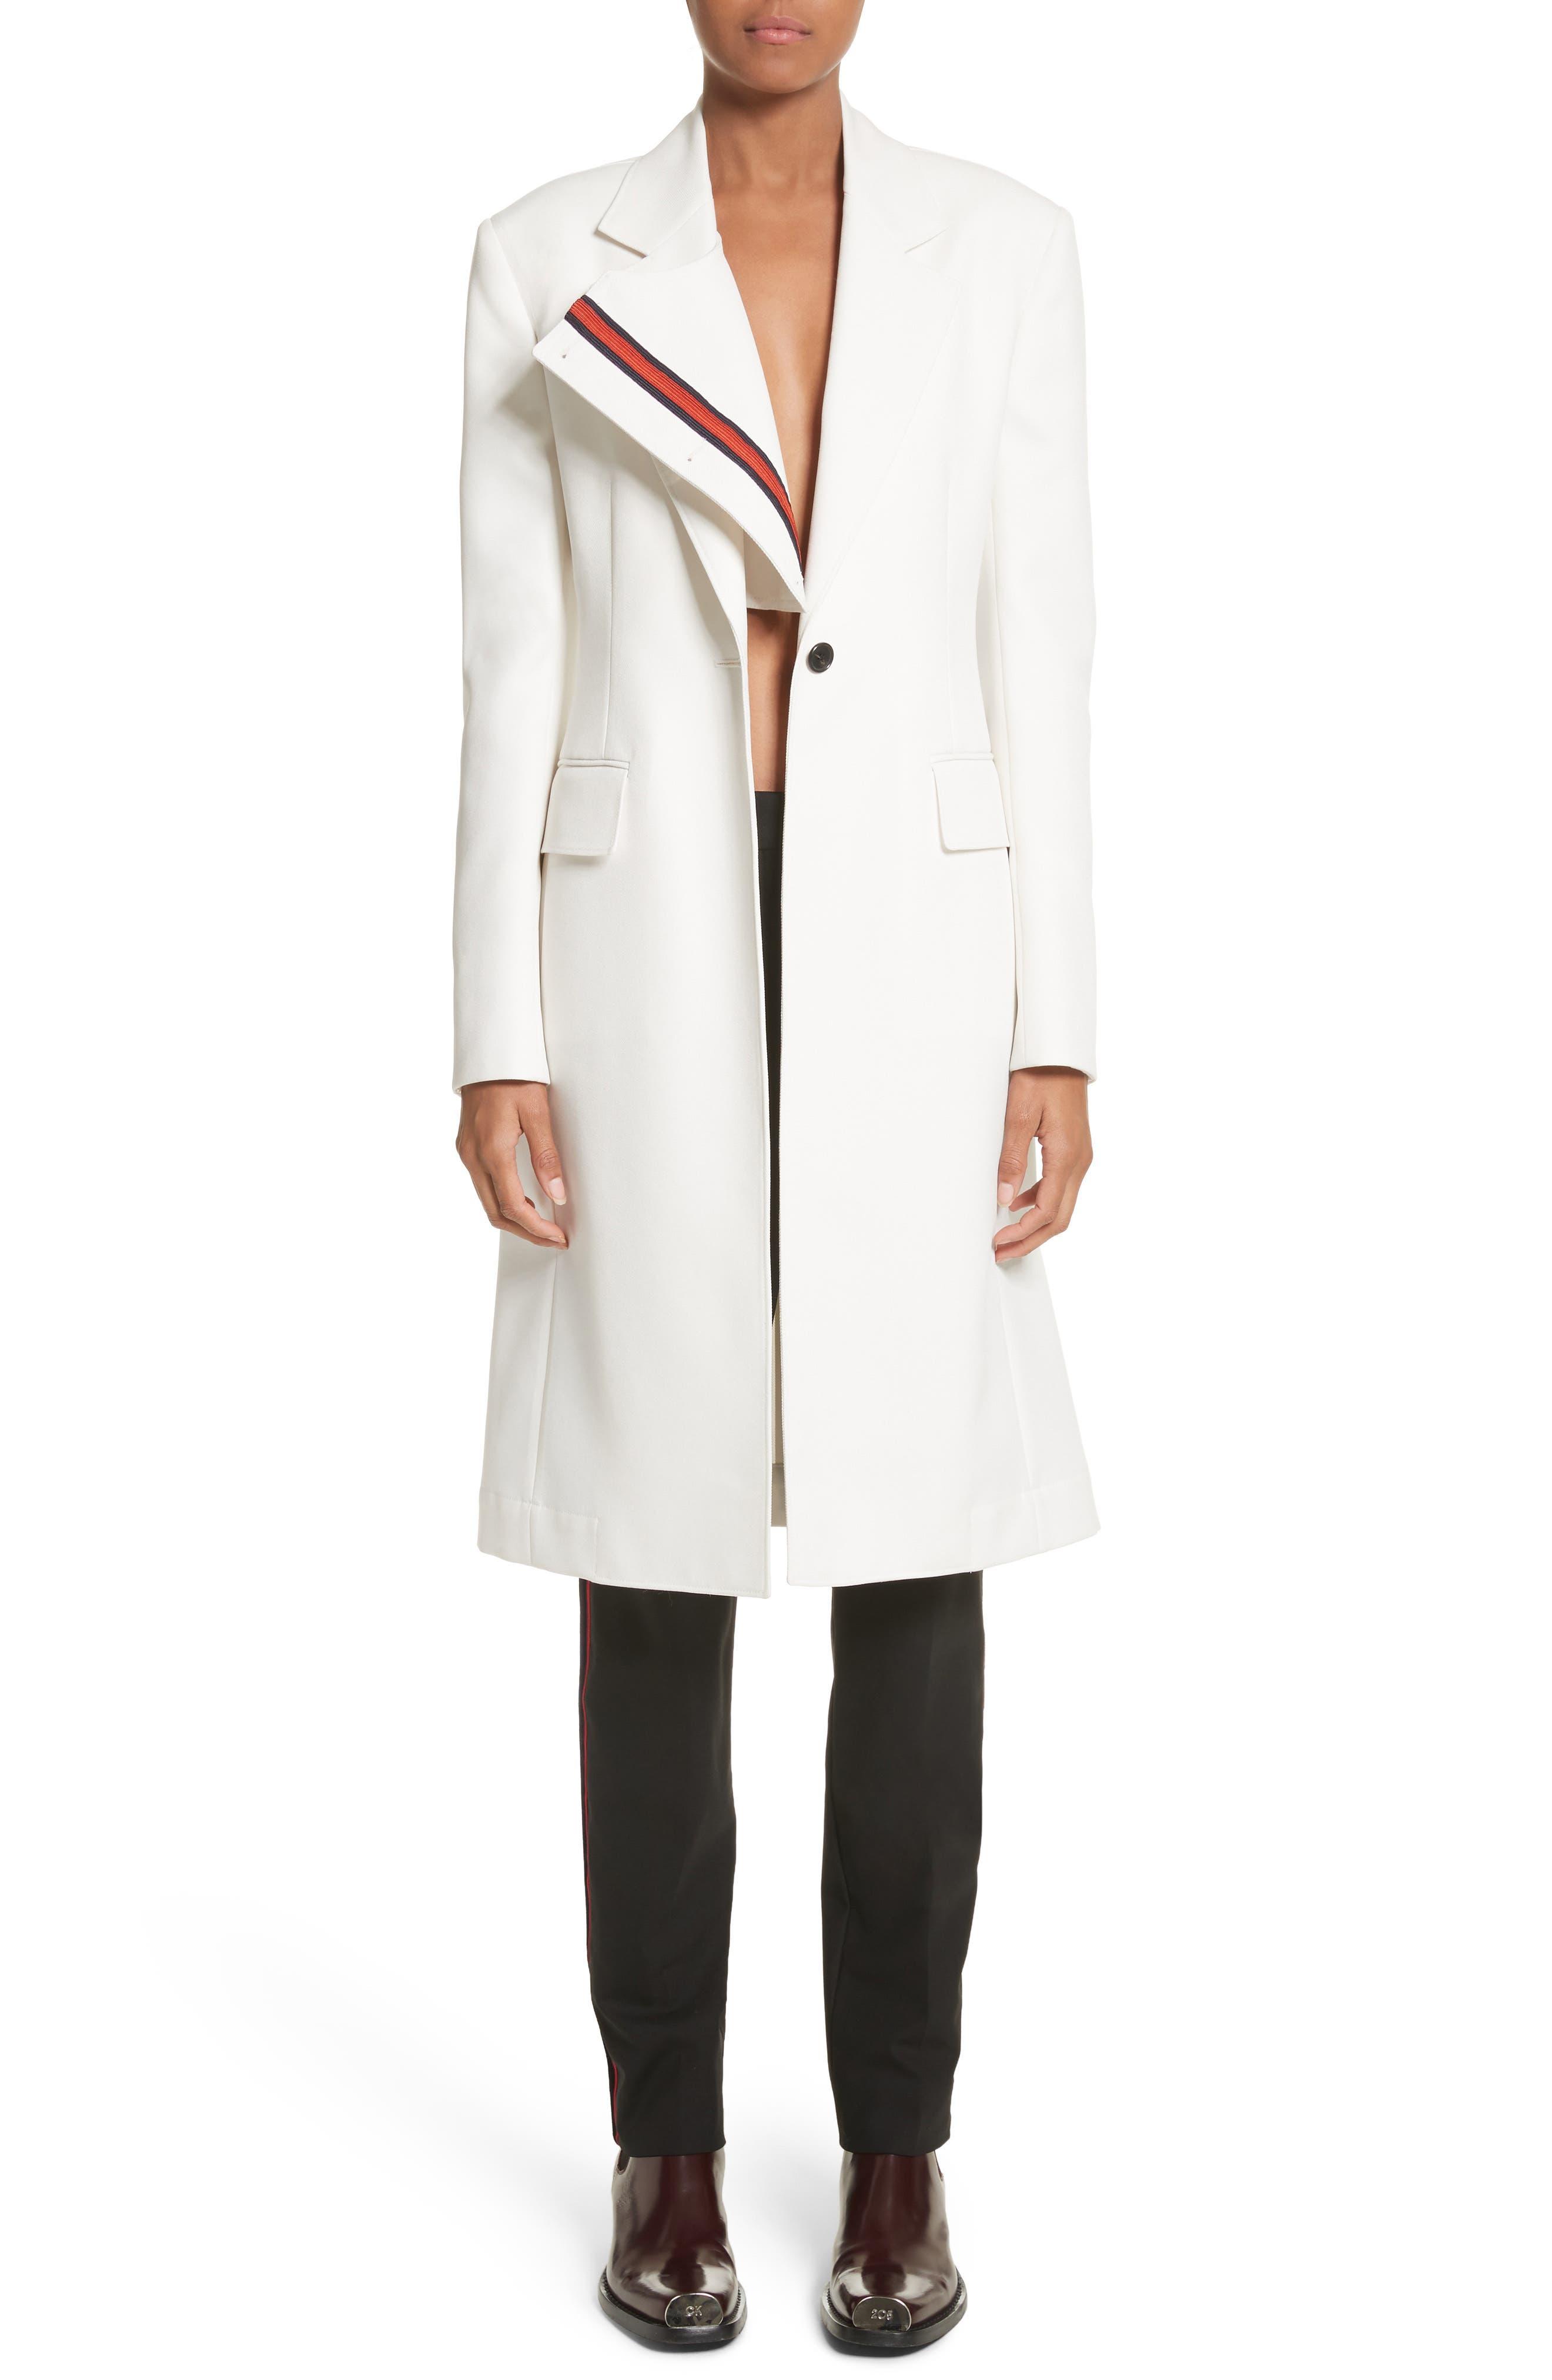 Alternate Image 1 Selected - CALVIN KLEIN 205W39NYC Uniform Stripe Coat